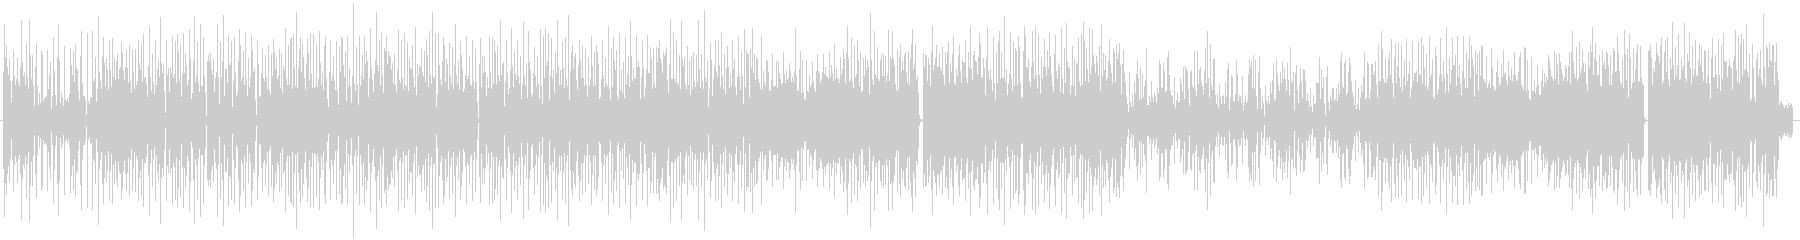 BlueBoy 楽器のみバージョンの未再生の波形